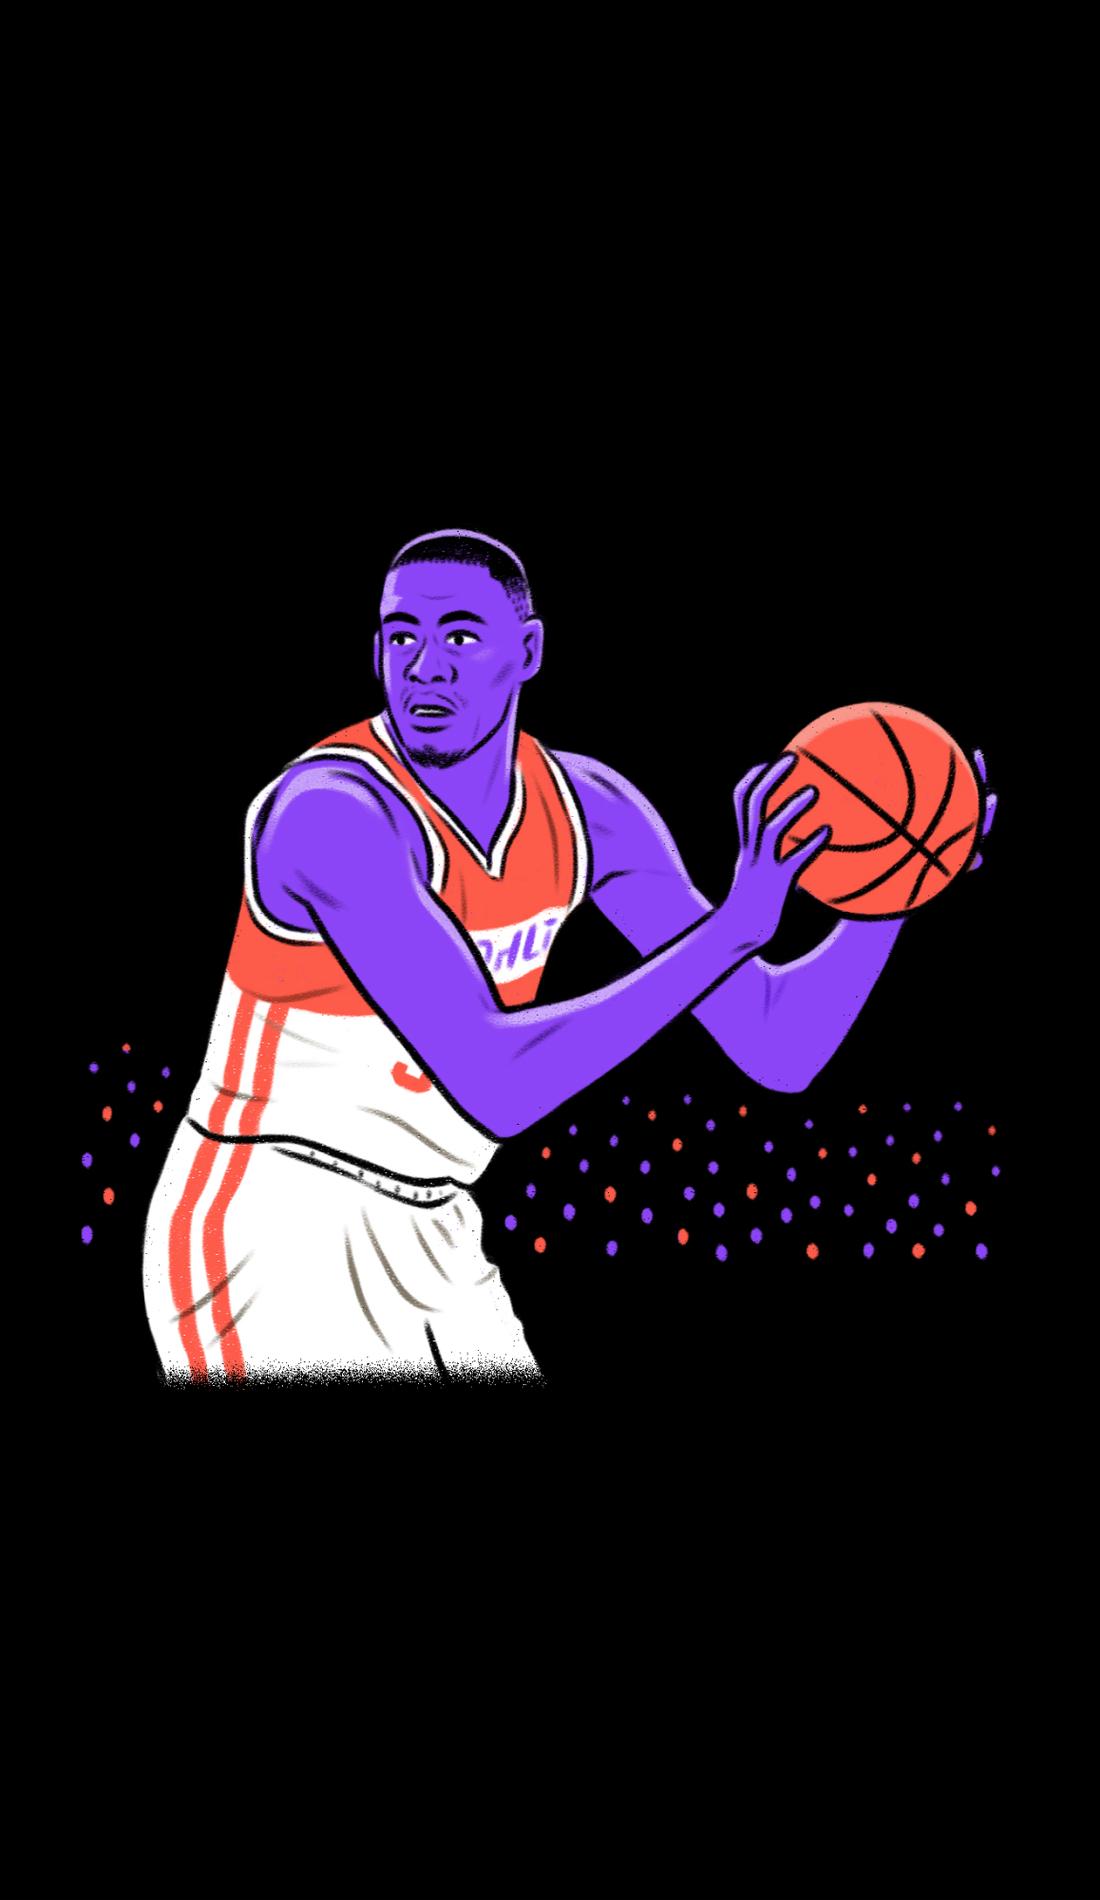 A Creighton Bluejays Basketball live event